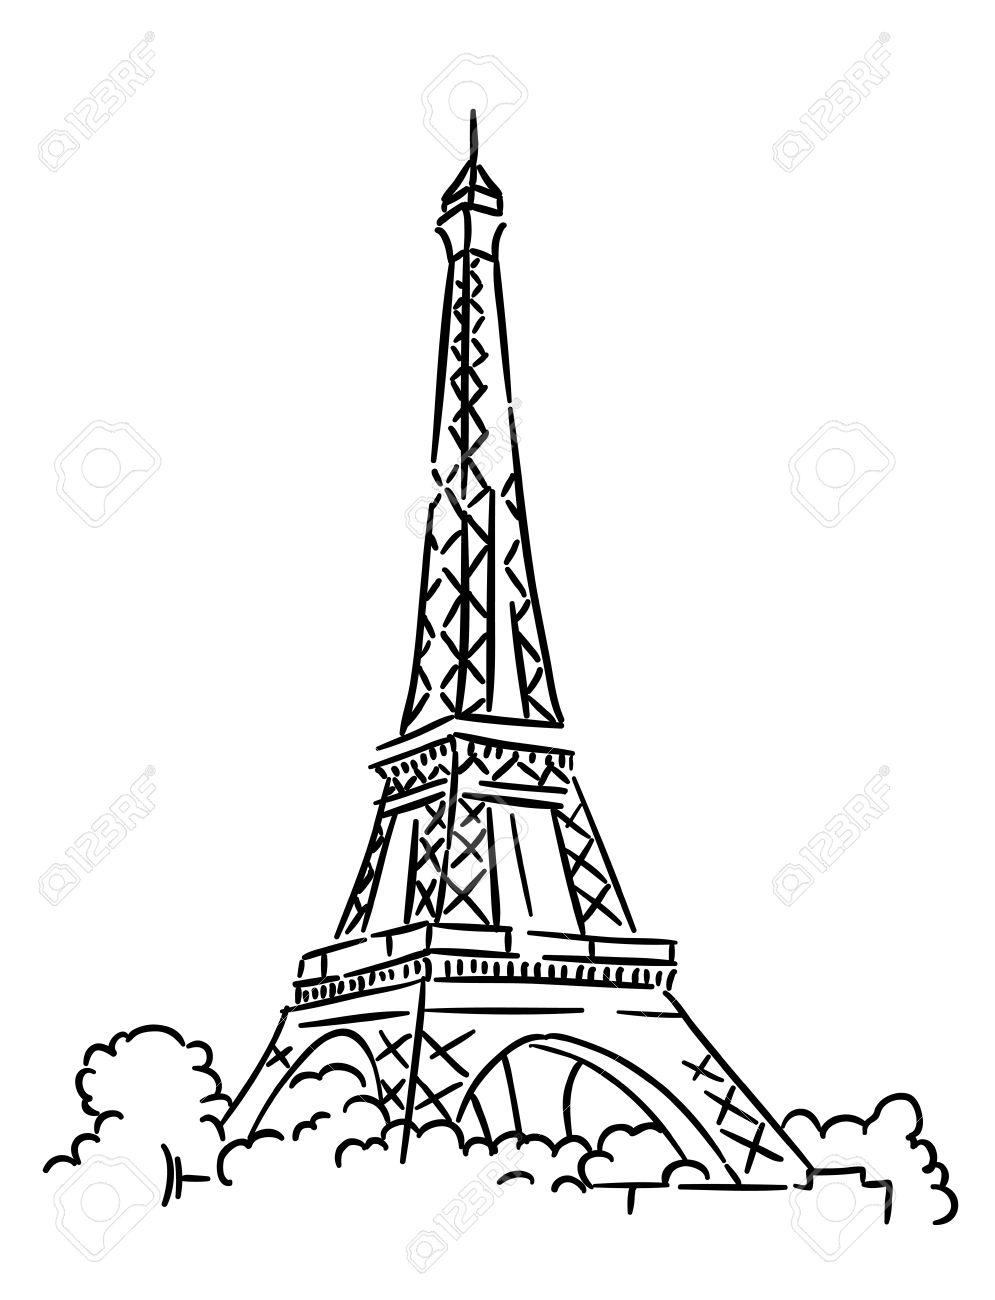 Eiffel tower in Paris, France. Sketch vector illustration.